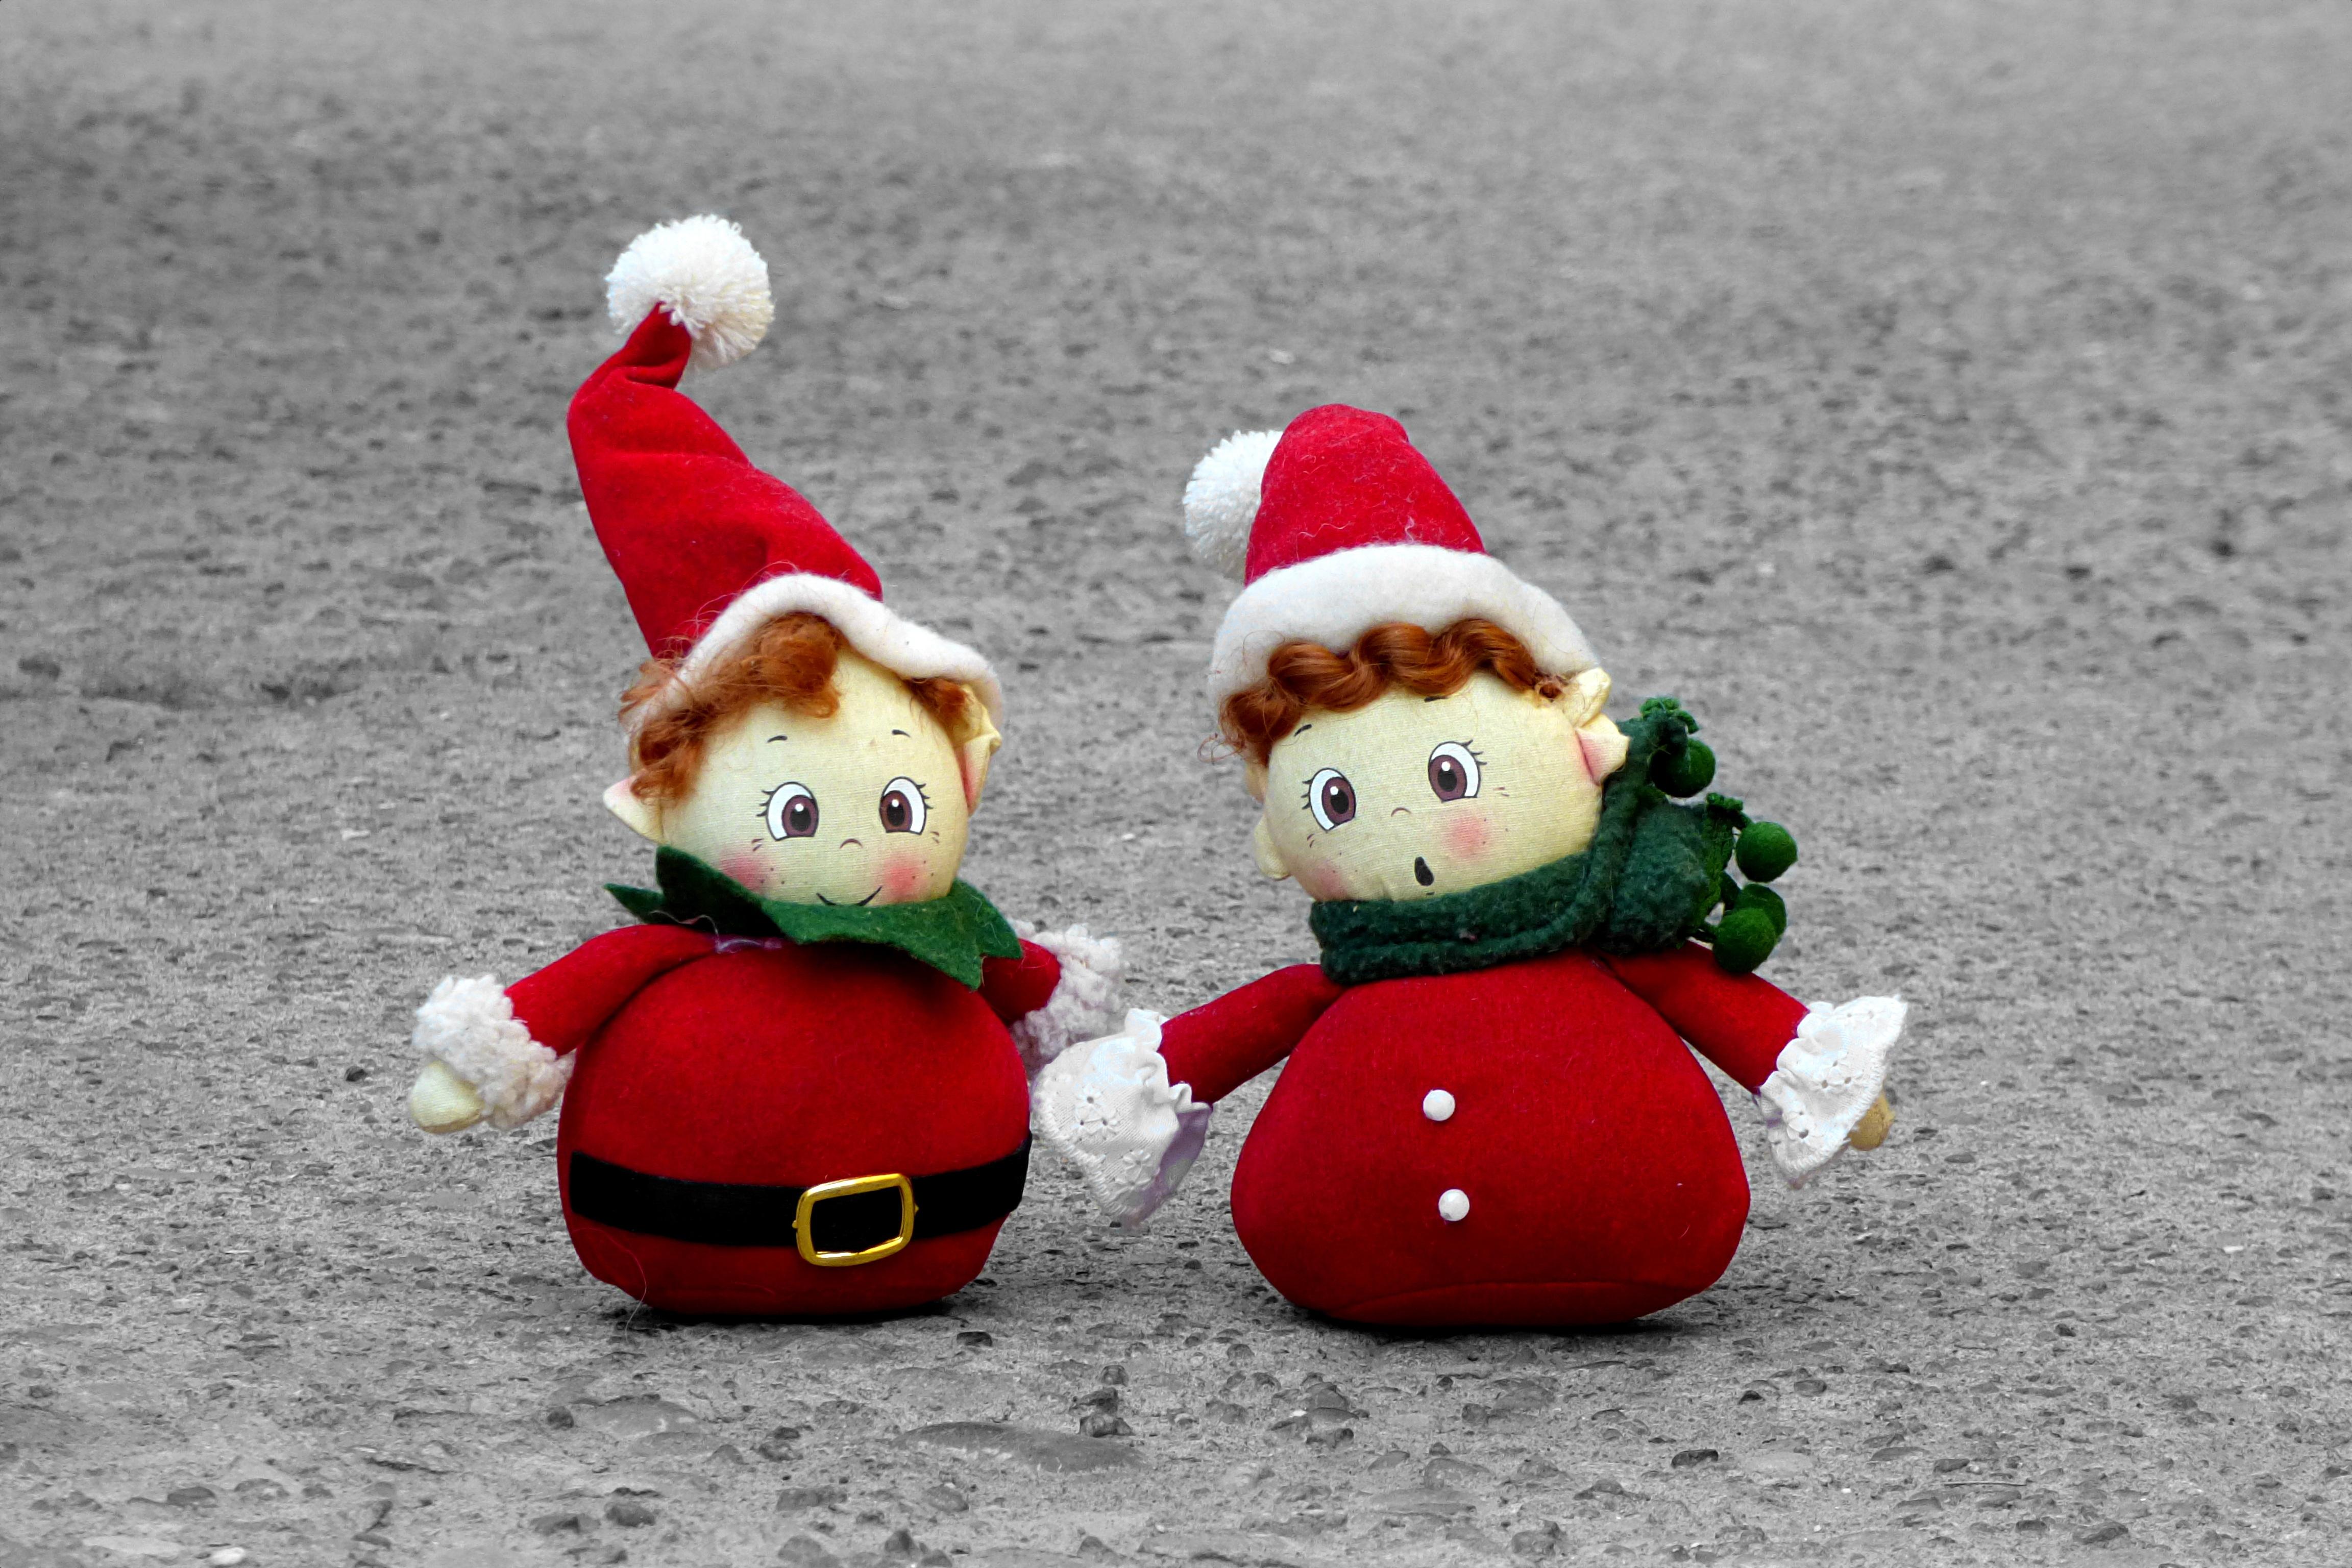 red christmas toy snowman toys santa claus goblins stuffed toy santa claus hat - Stuffed Santa Claus